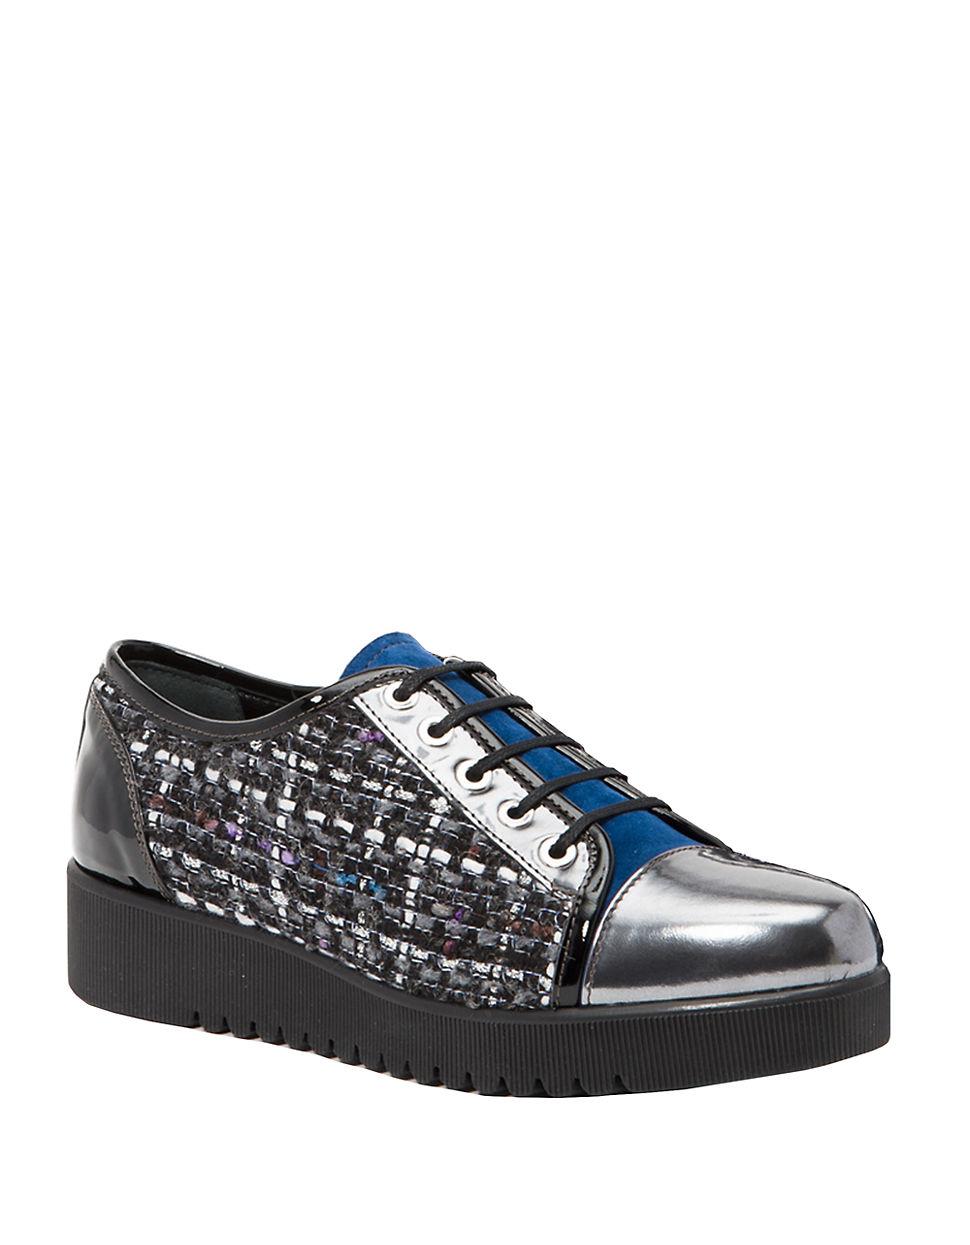 Aquatalia Ada Color-blocked Sneakers in Metallic